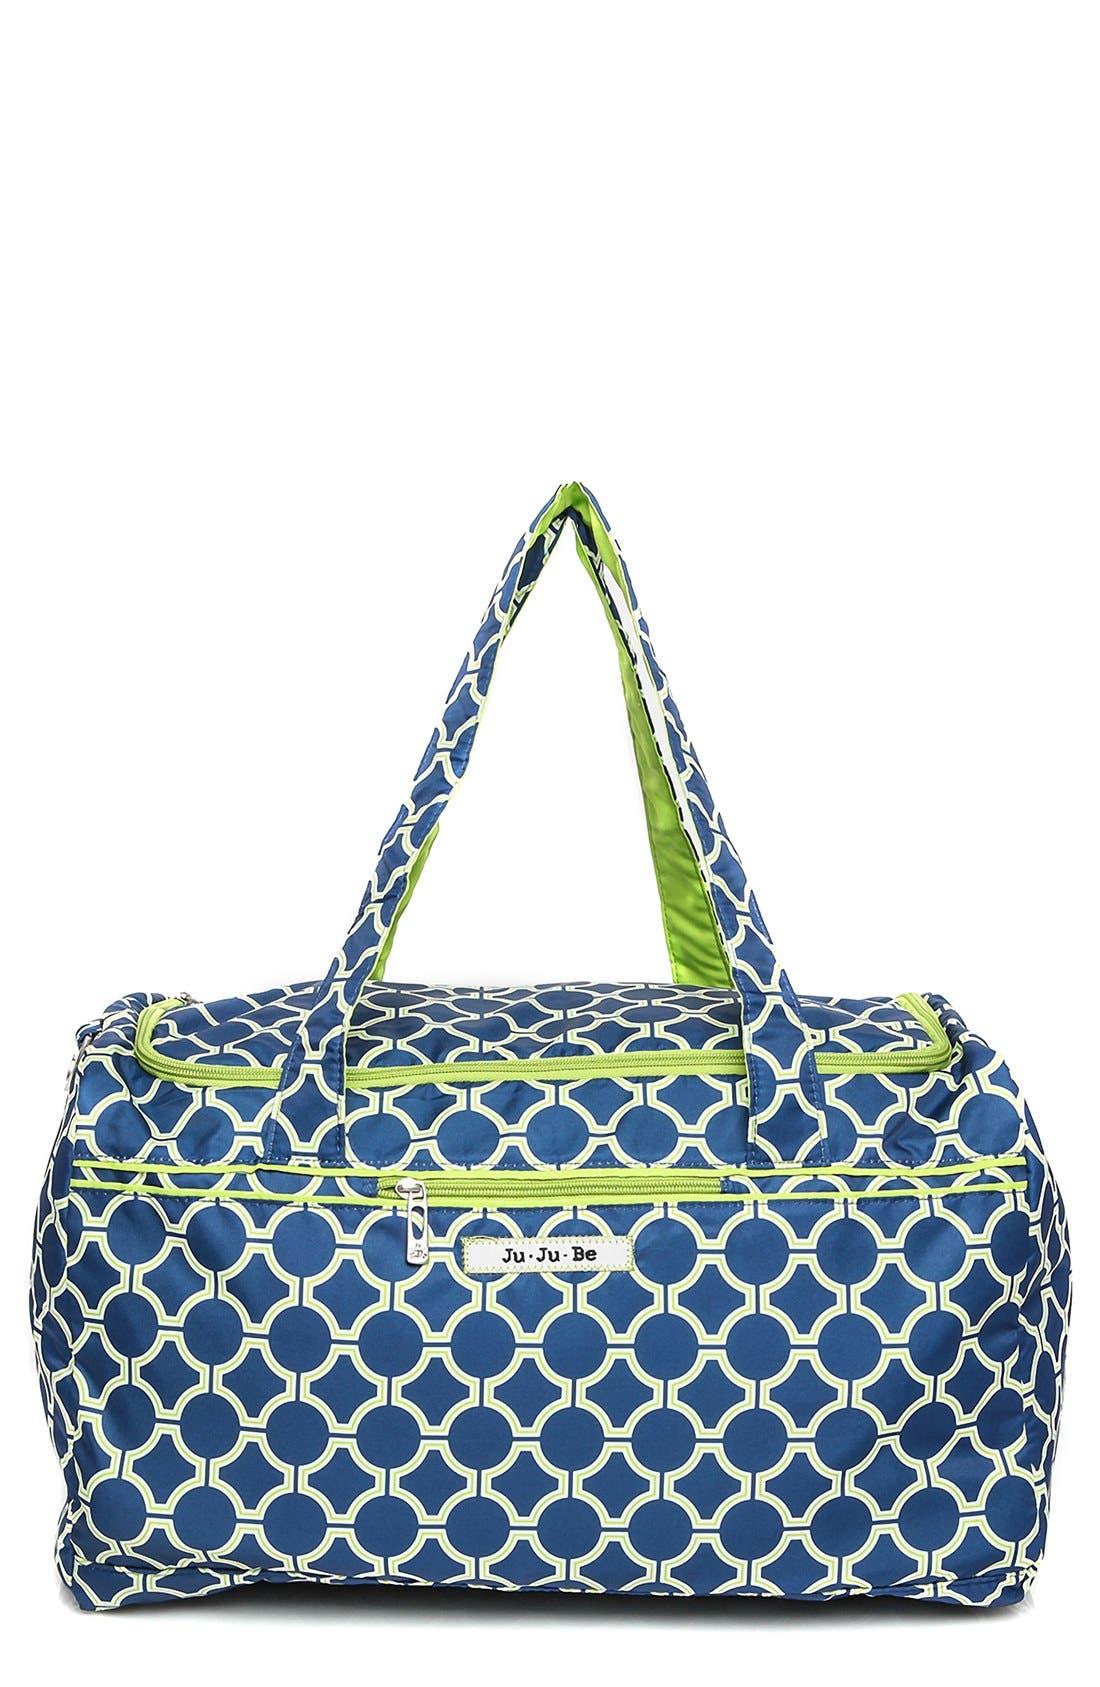 'Starlet' Travel Diaper Bag,                             Main thumbnail 1, color,                             Royal Envy